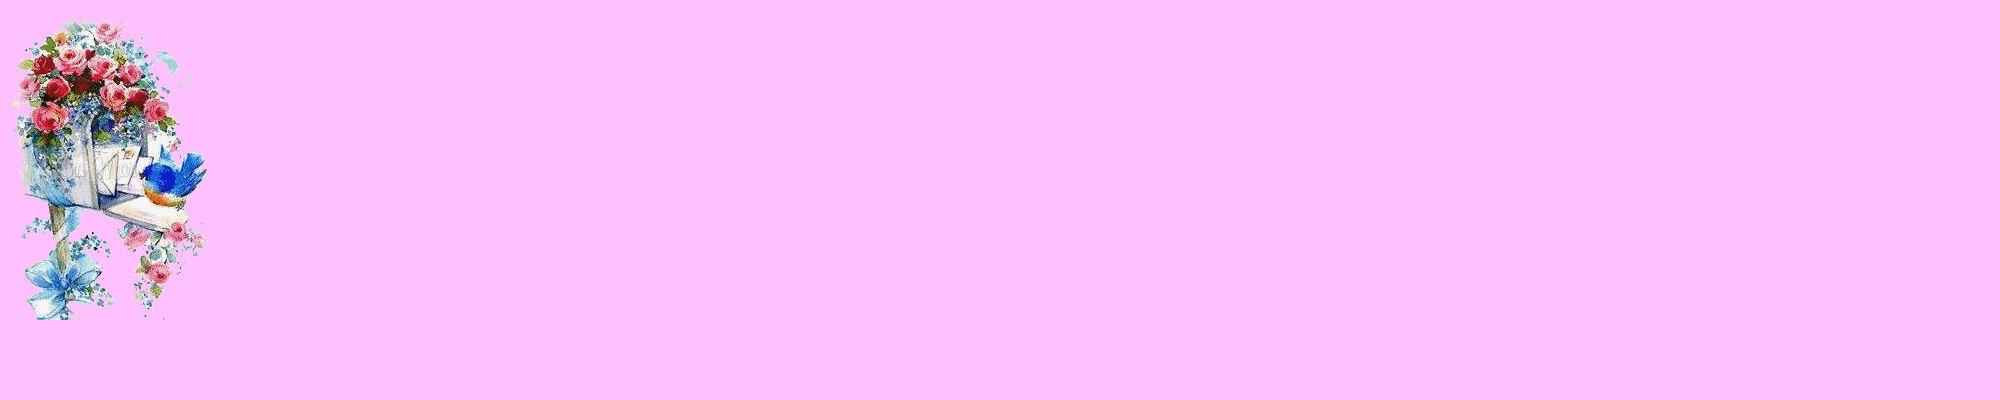 Fondo IM rosas_rosas_012.imf